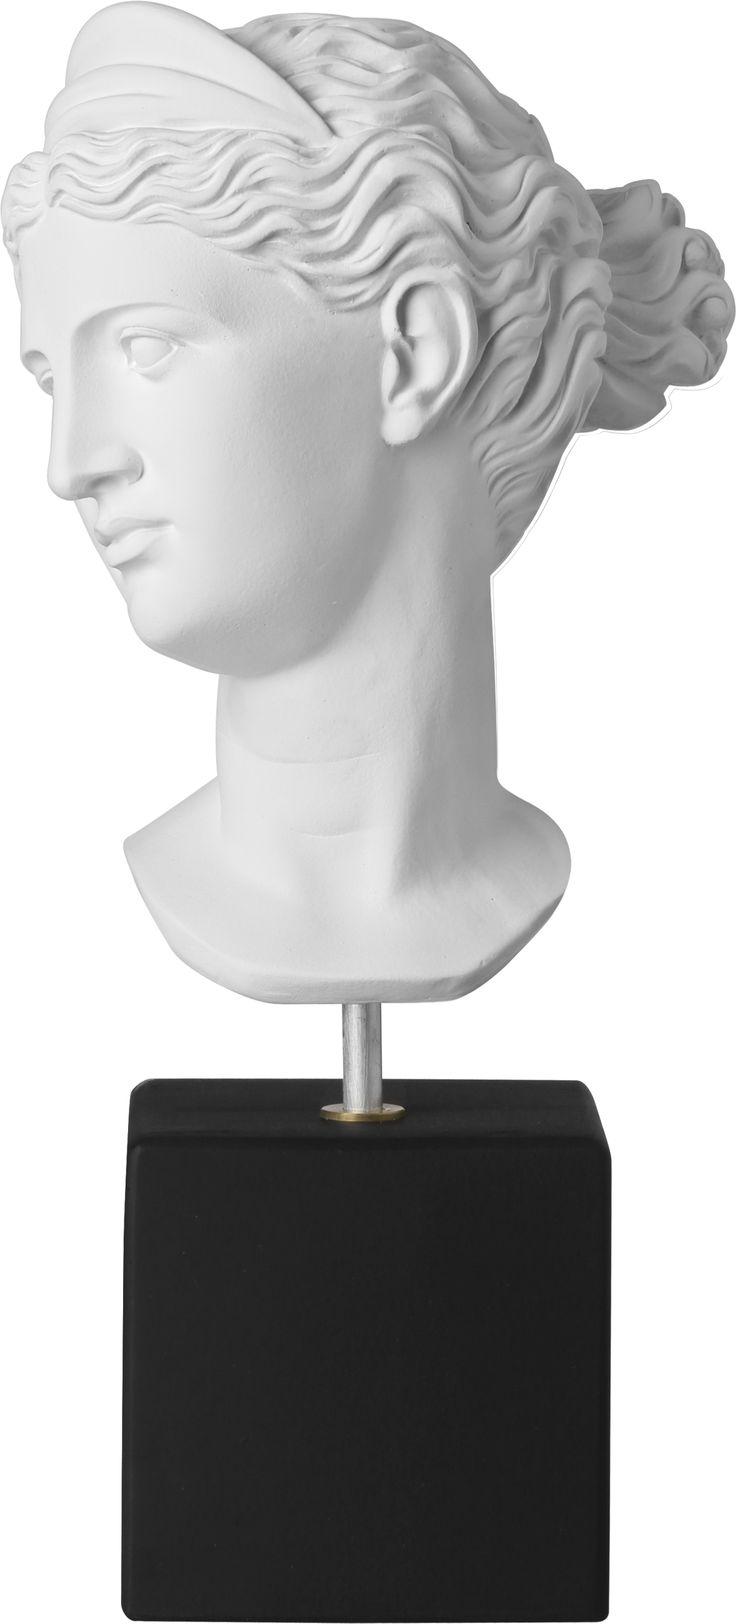 Artemis Weight: 4500 gr Dimension: 38,5x17,5x14,5cm Material: ceramine Color: white black